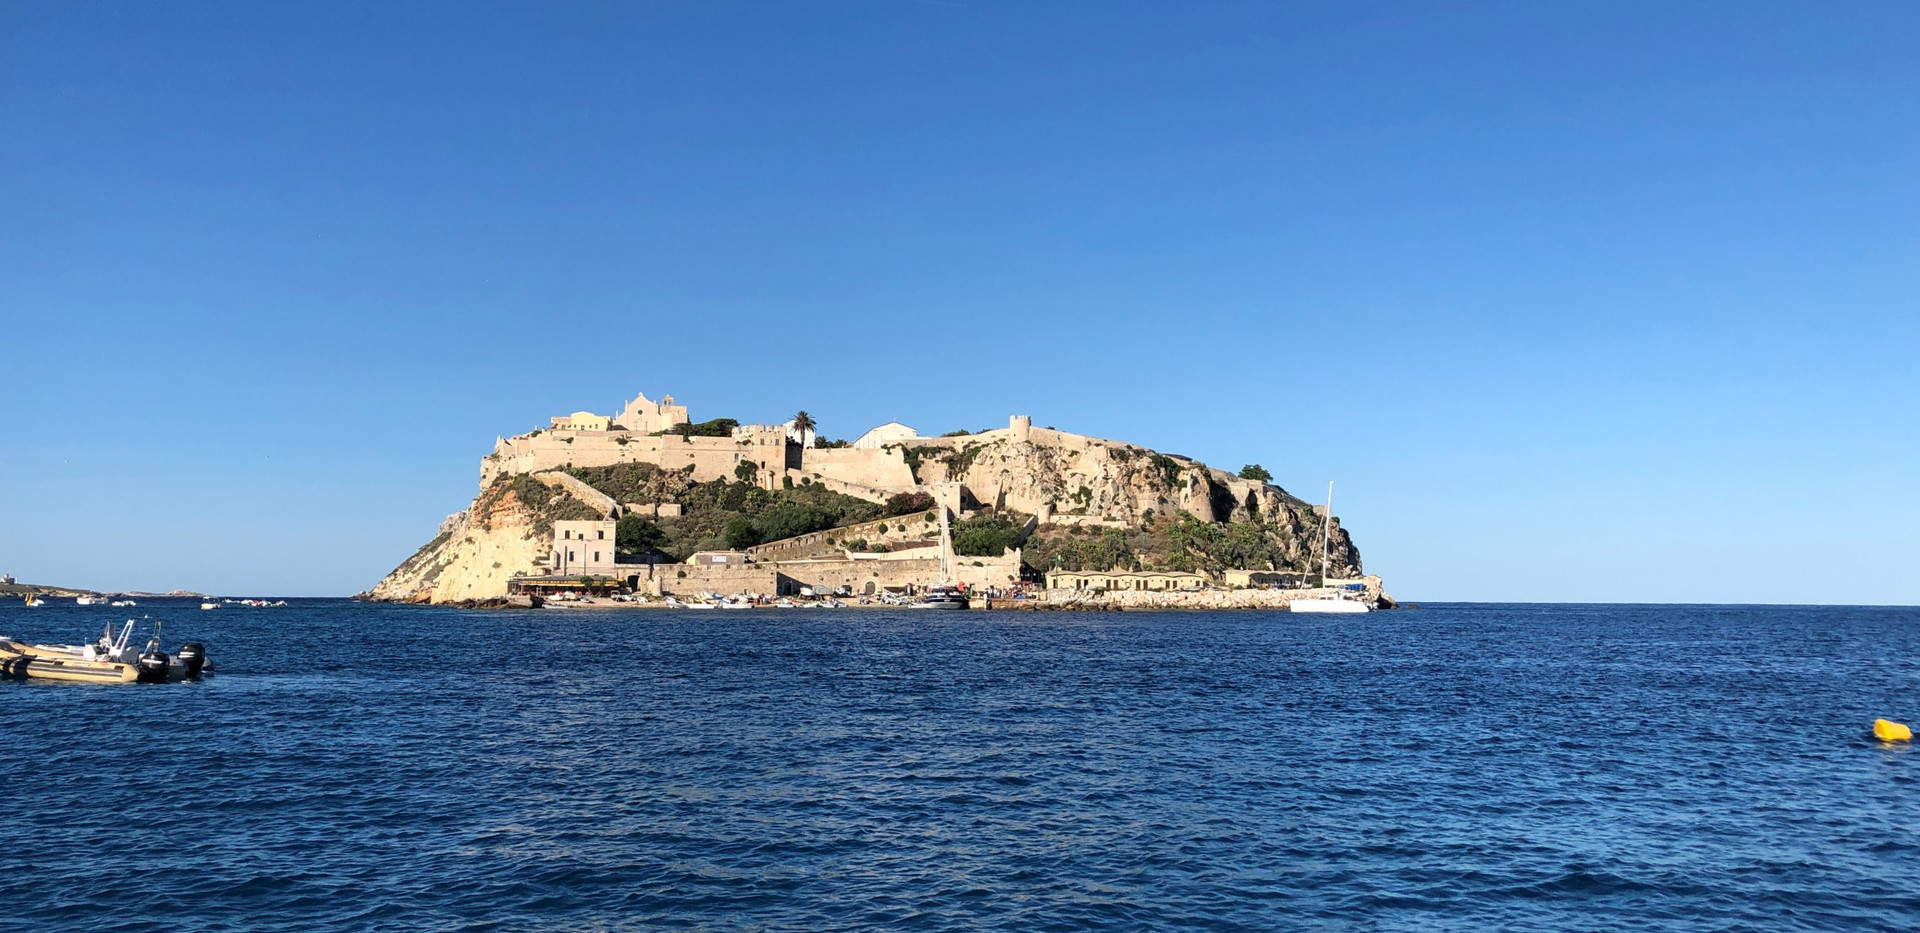 Isola San Nicola